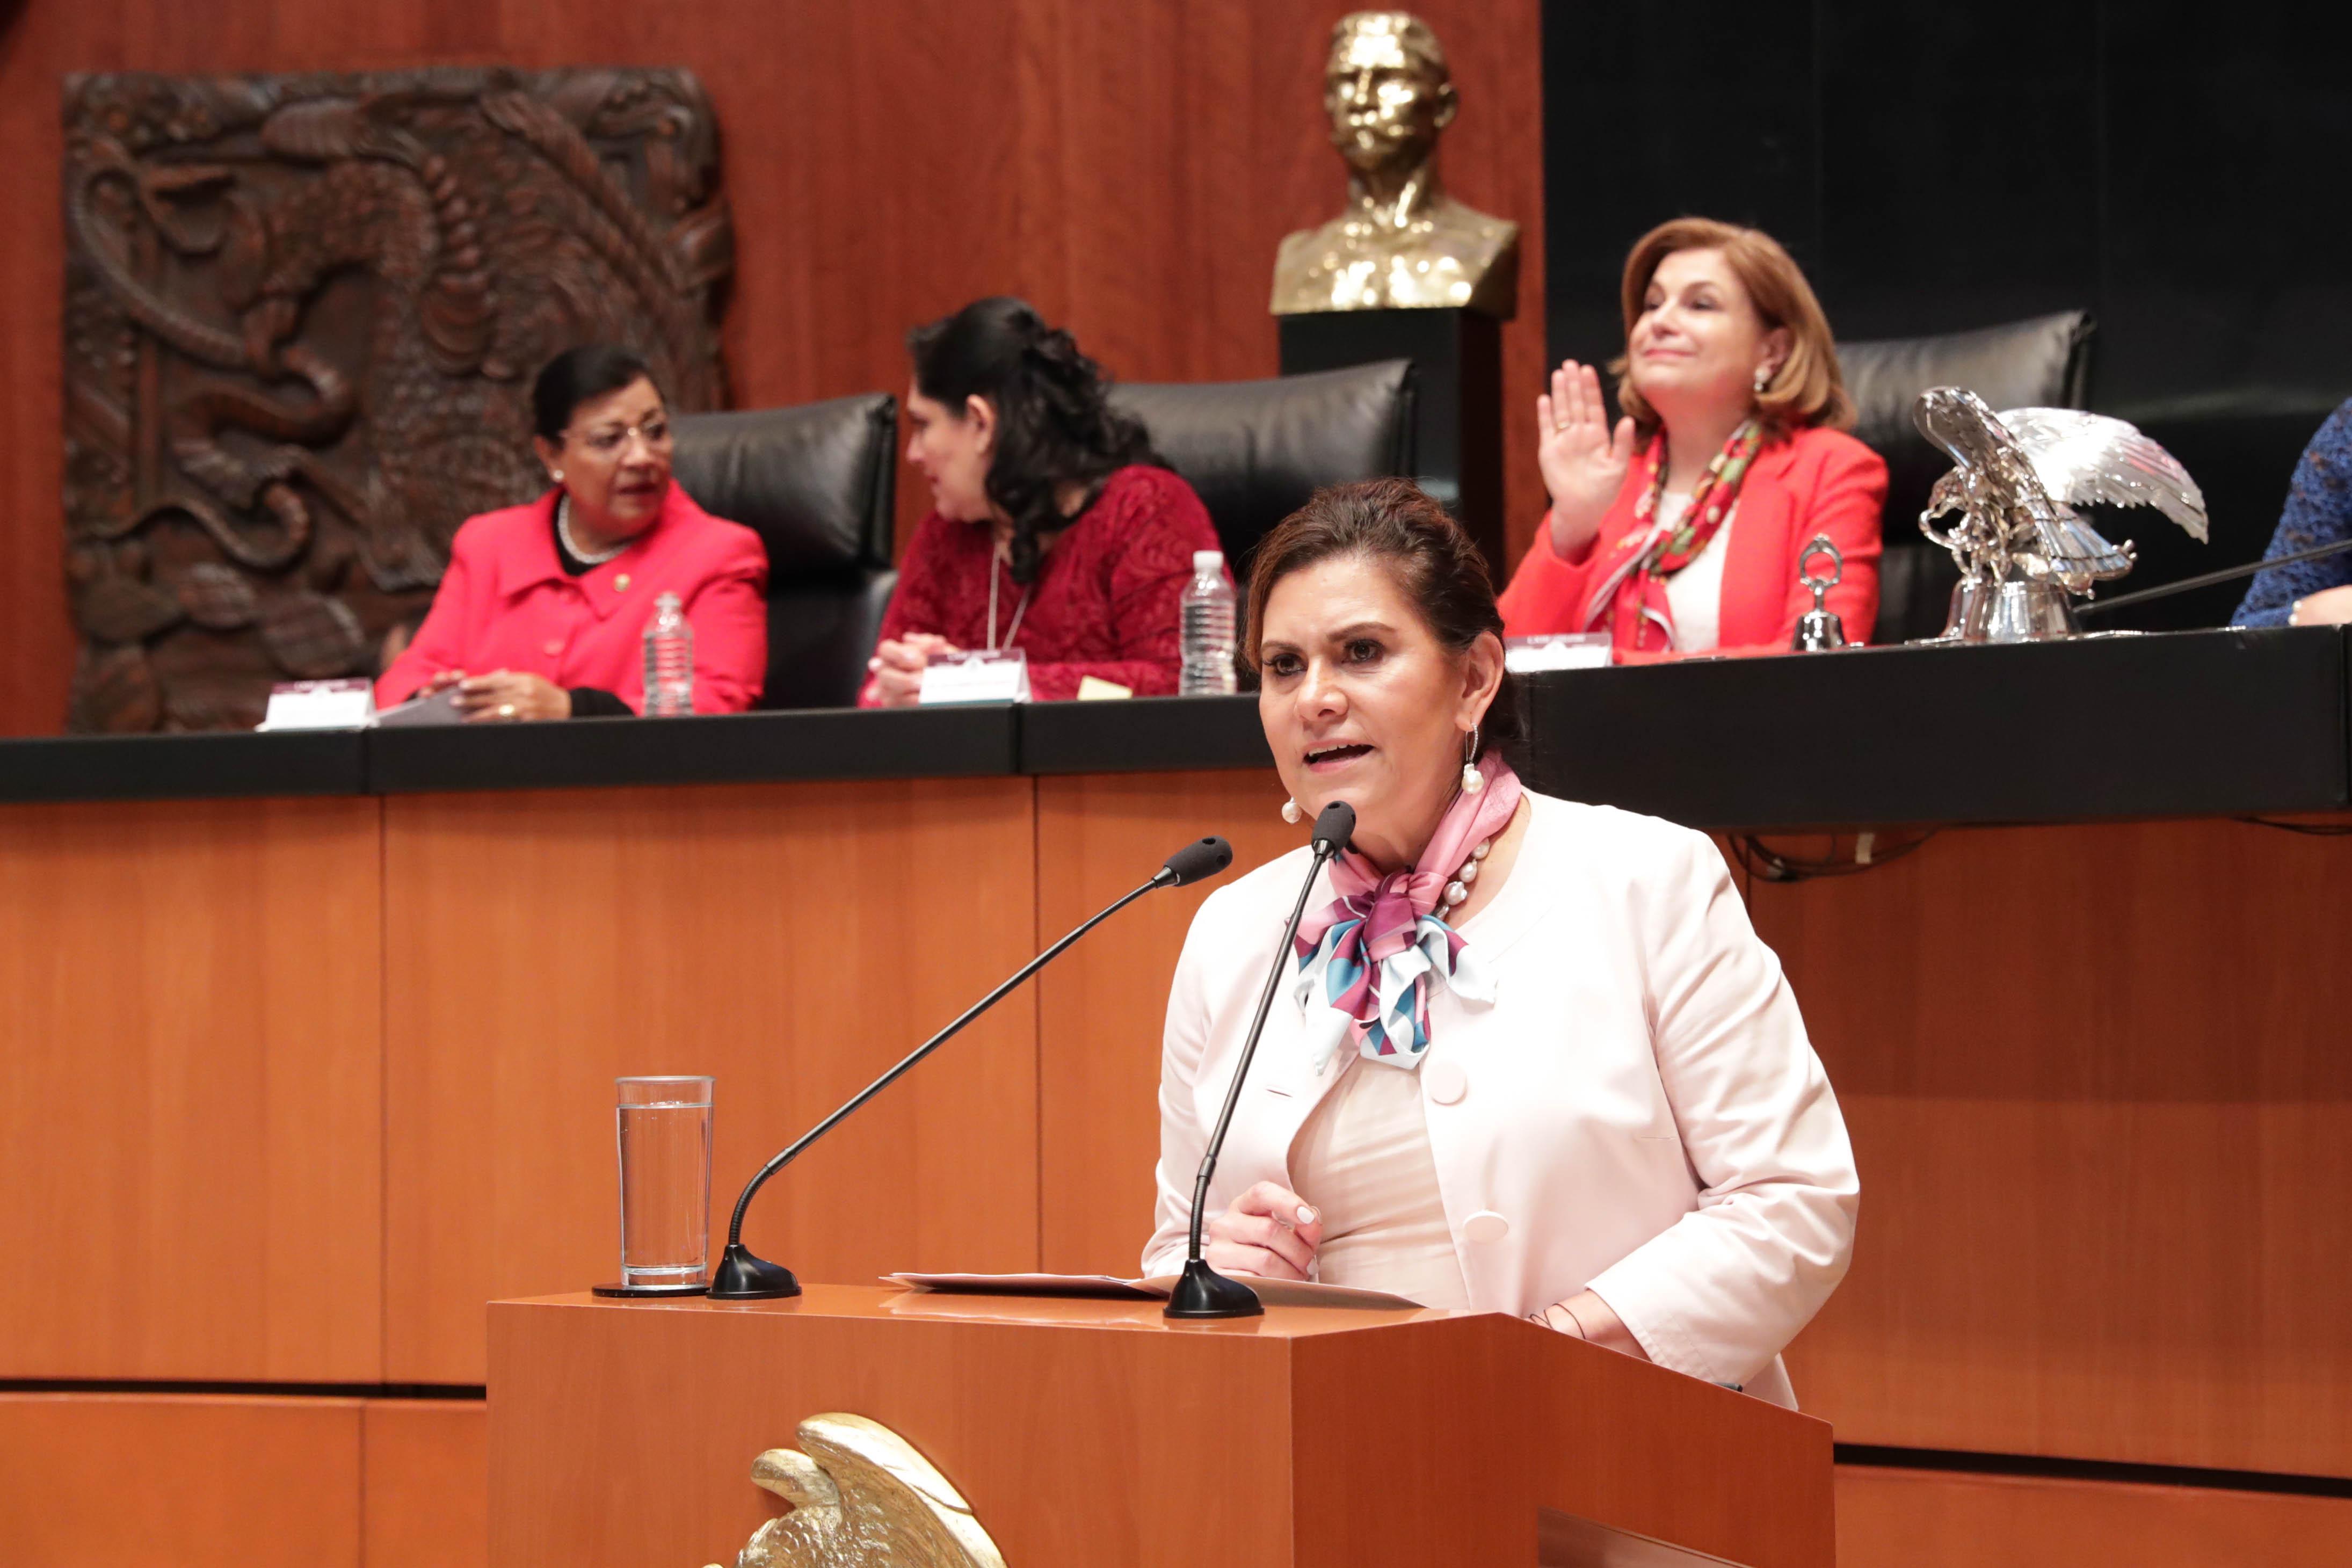 voto de la mujer 8